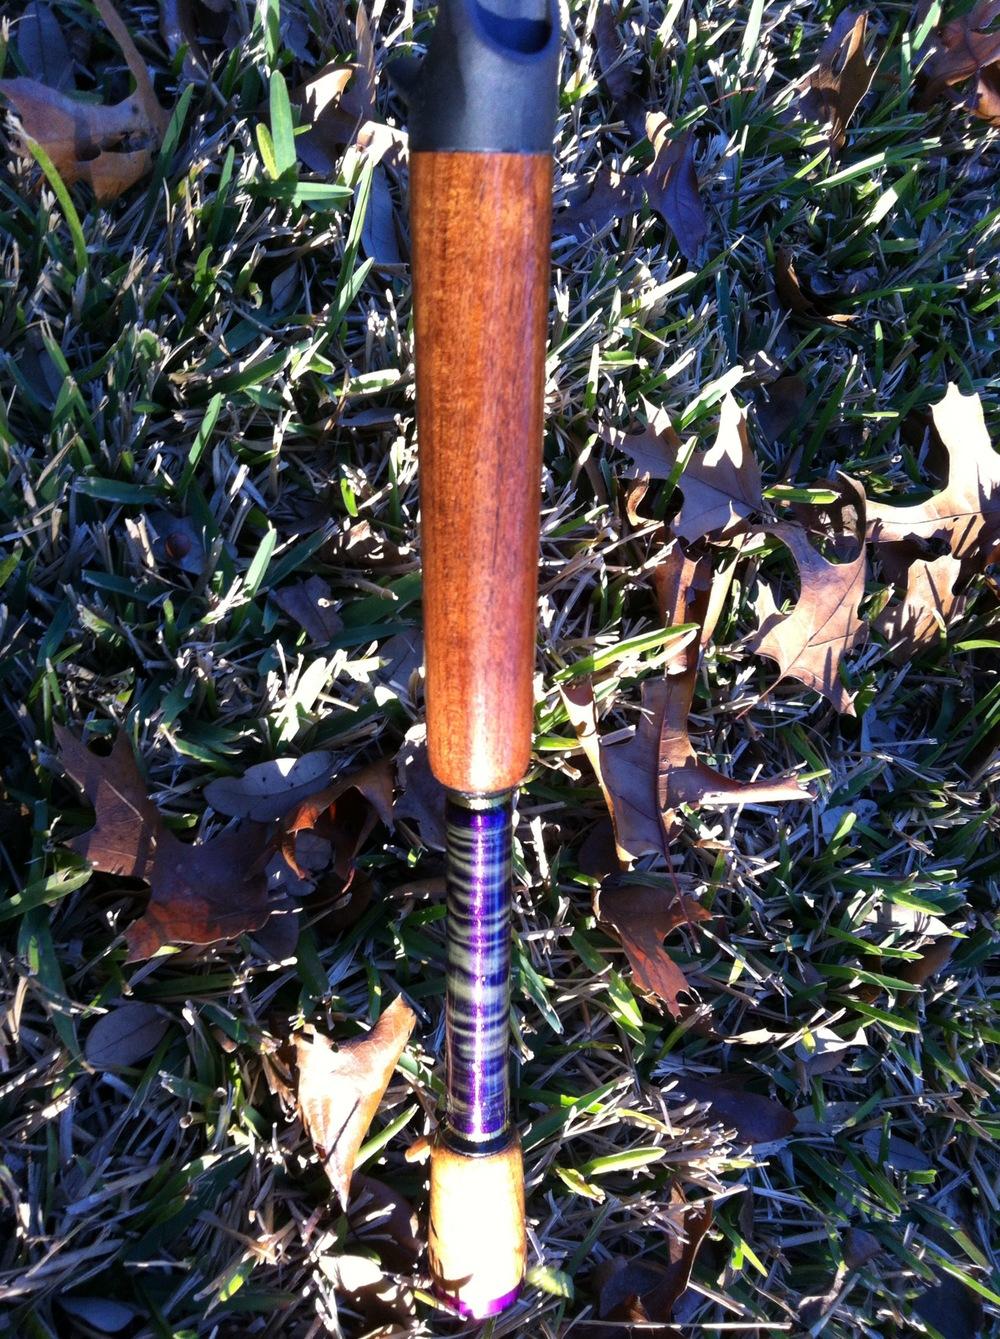 A Mesquite Wood split grip handle with purple hologram thread wrap. Very nice.